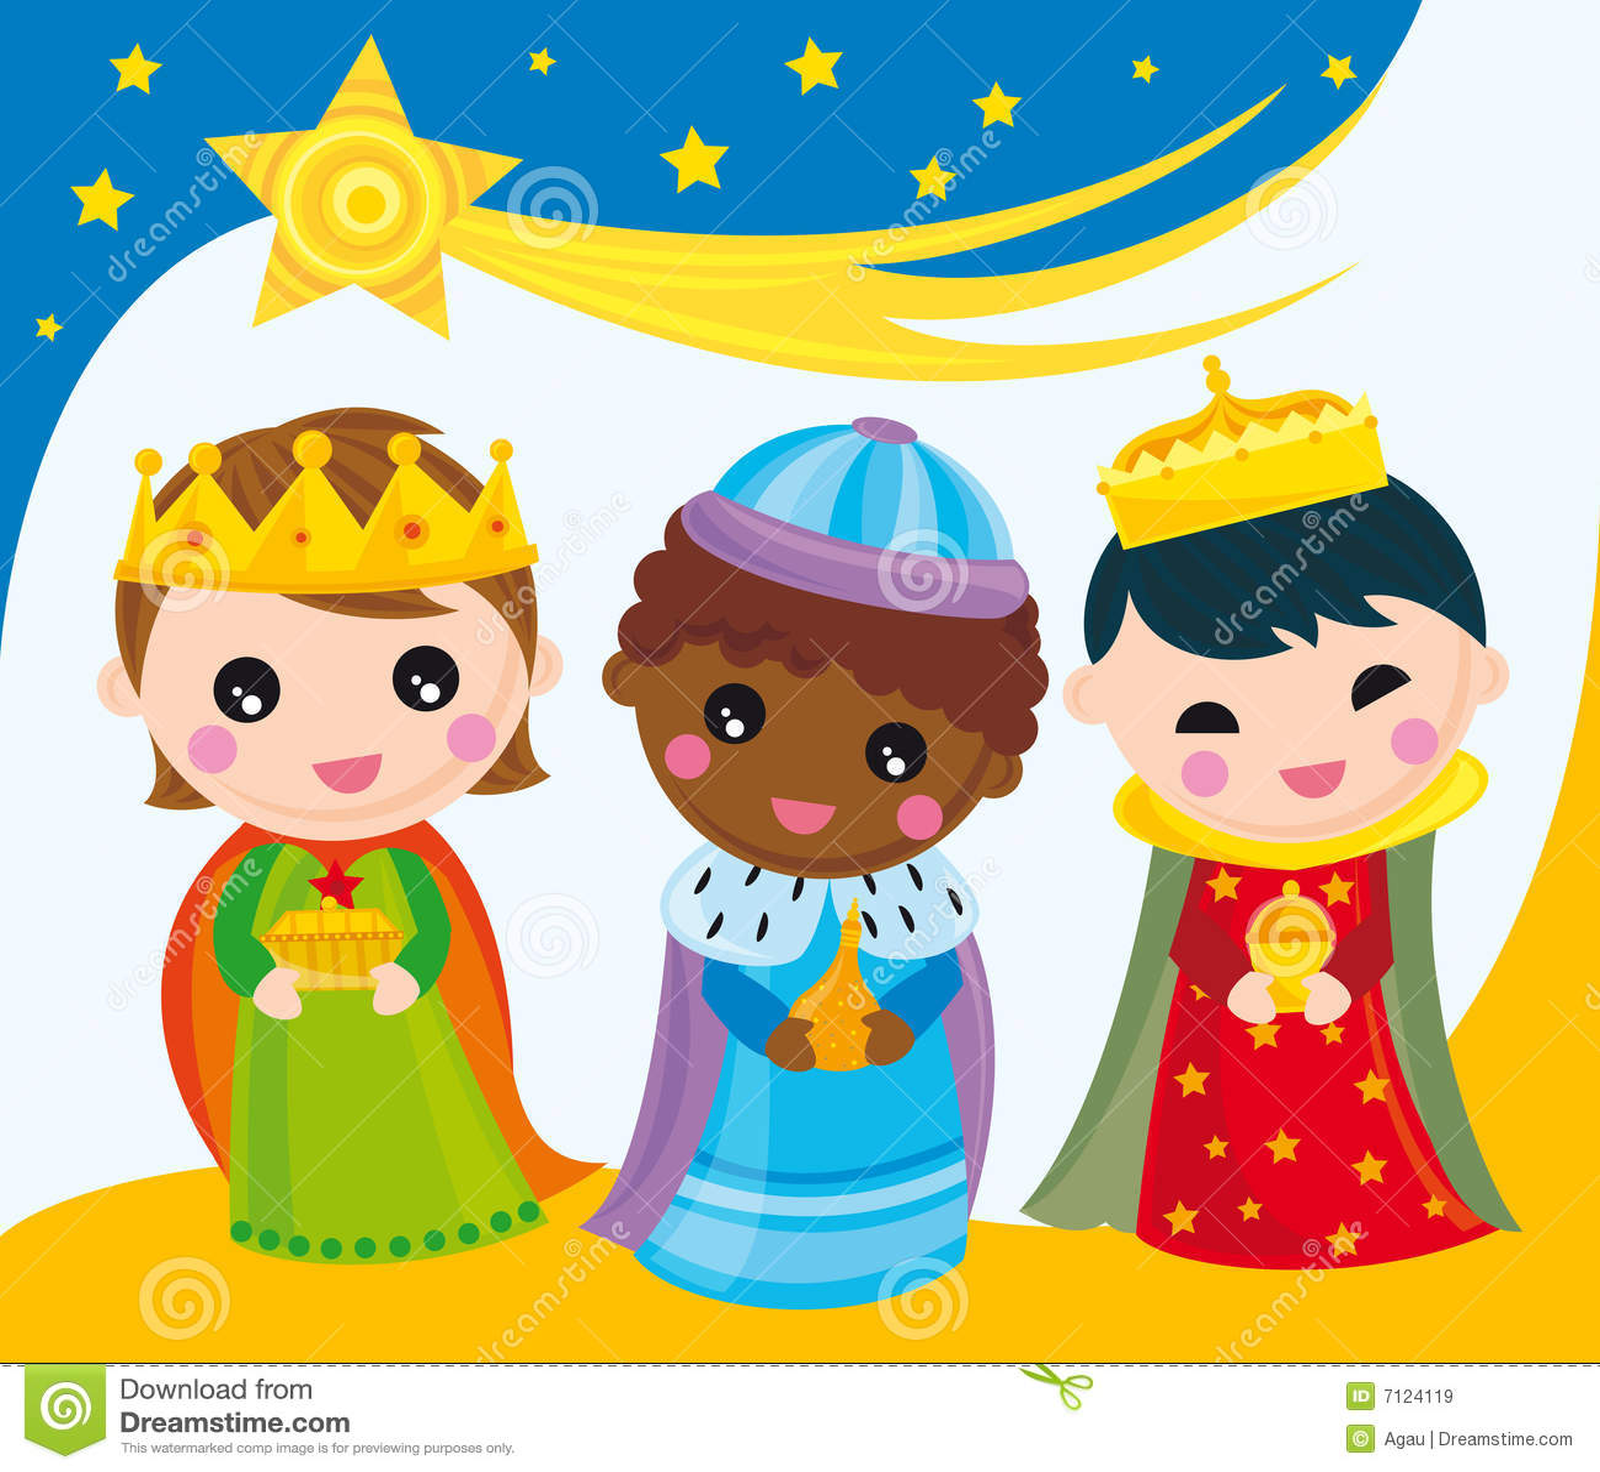 three kings royalty free stock images image 7124119 Jesus Christ Black White Clip Art Jesus Christ